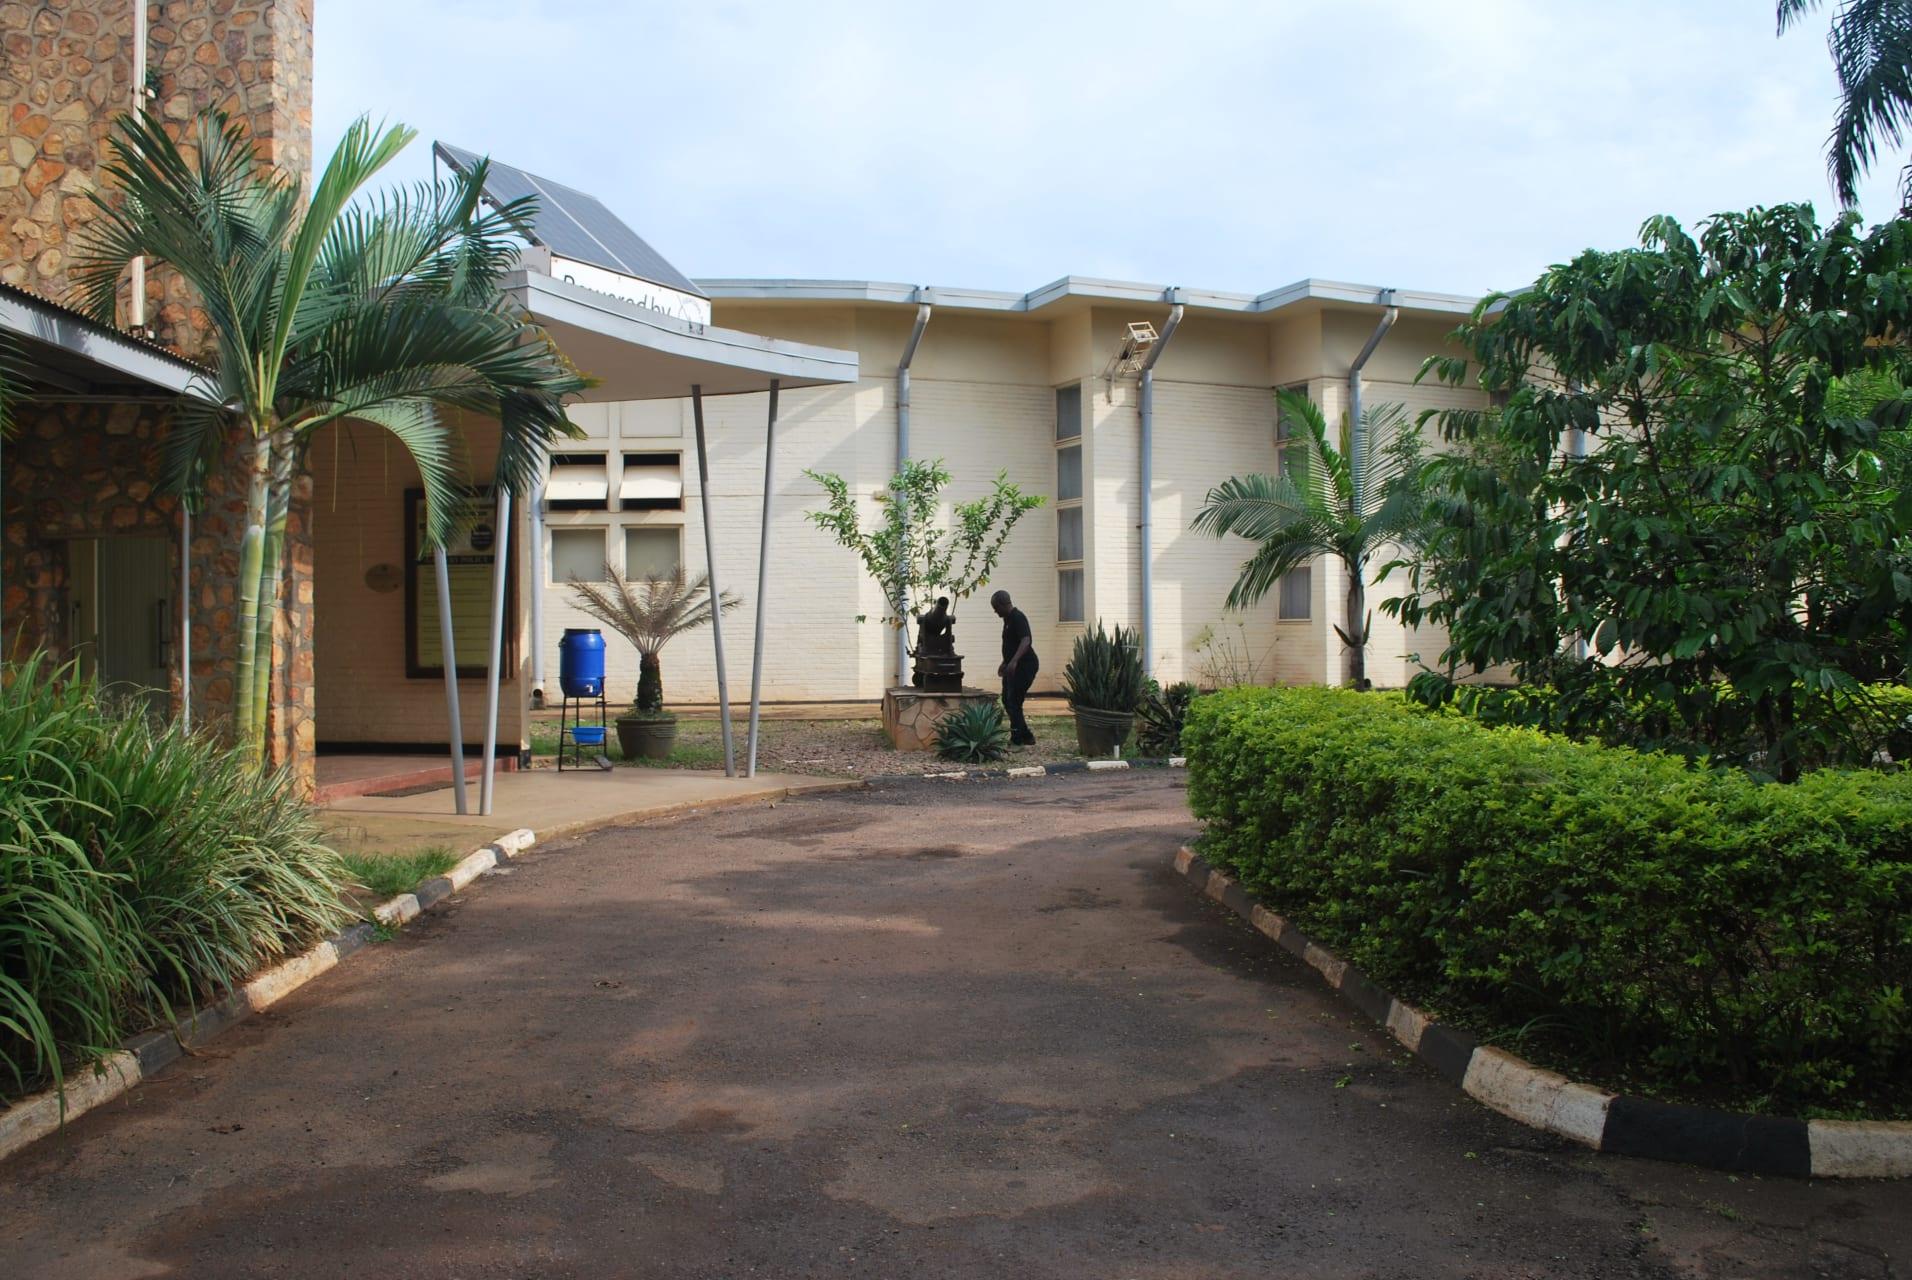 Kampala - Uganda National Museum- International Sign Language Guided Tour!